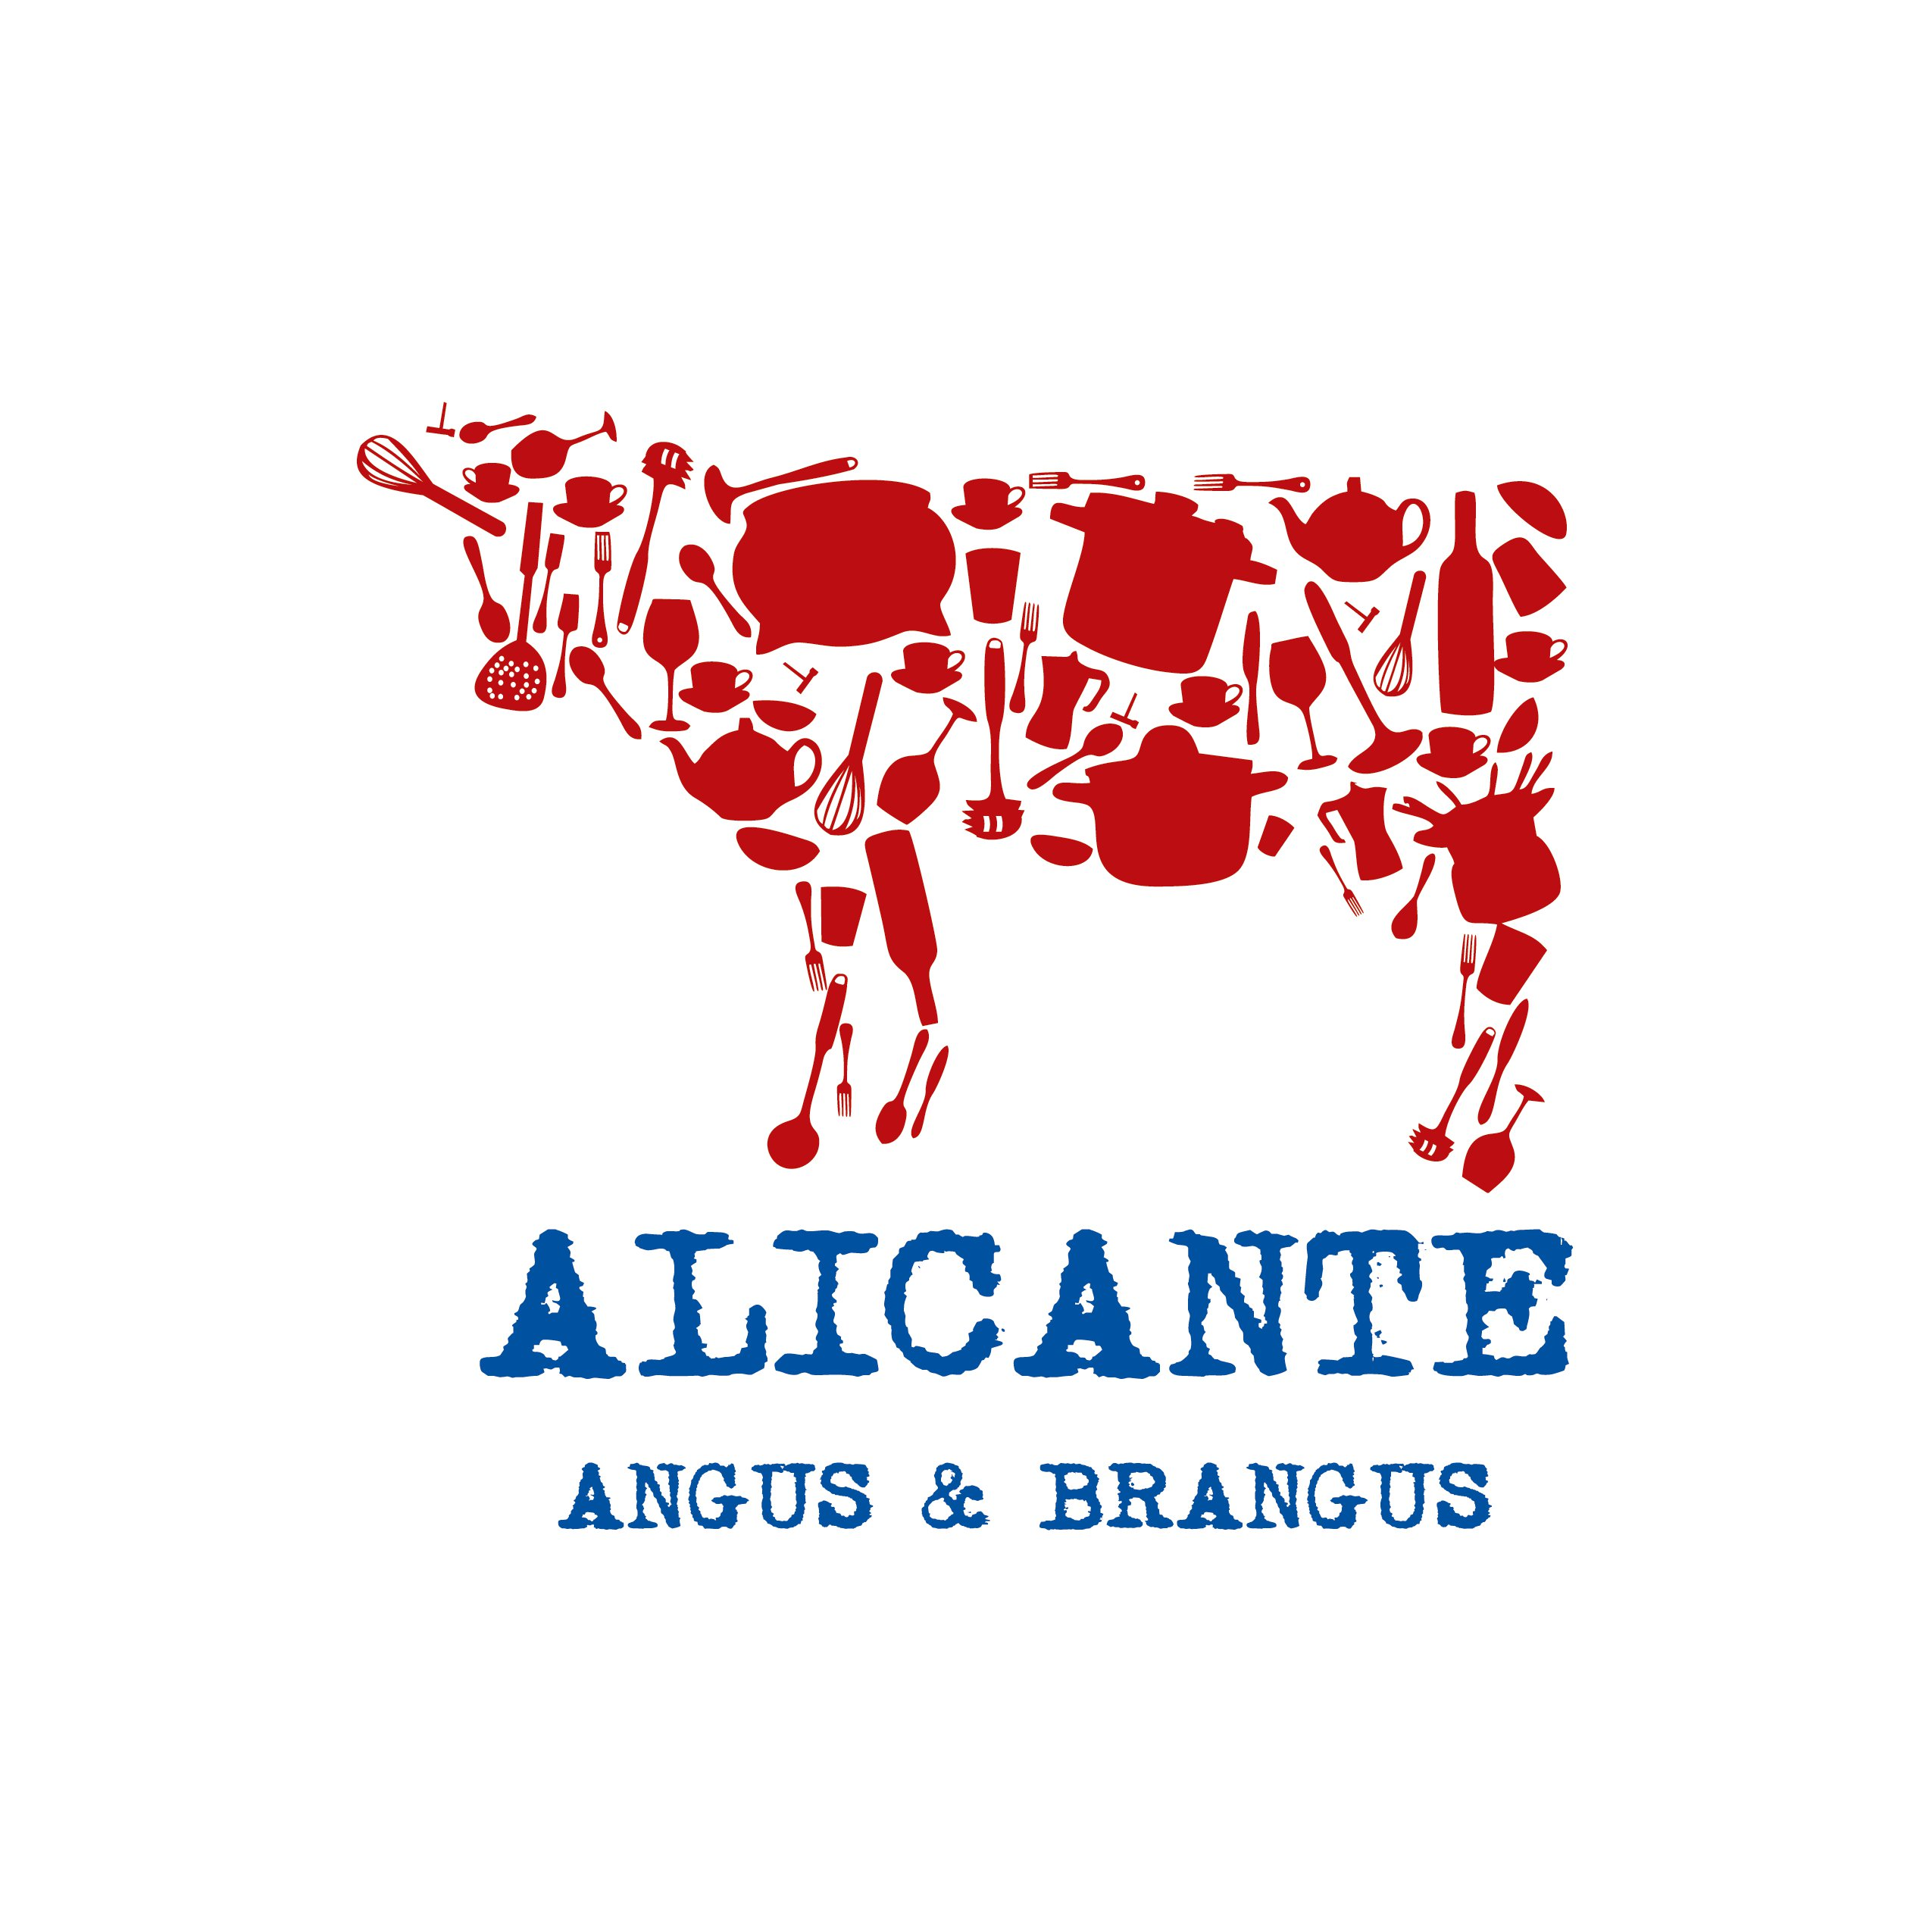 Alicante Angus & Brangus